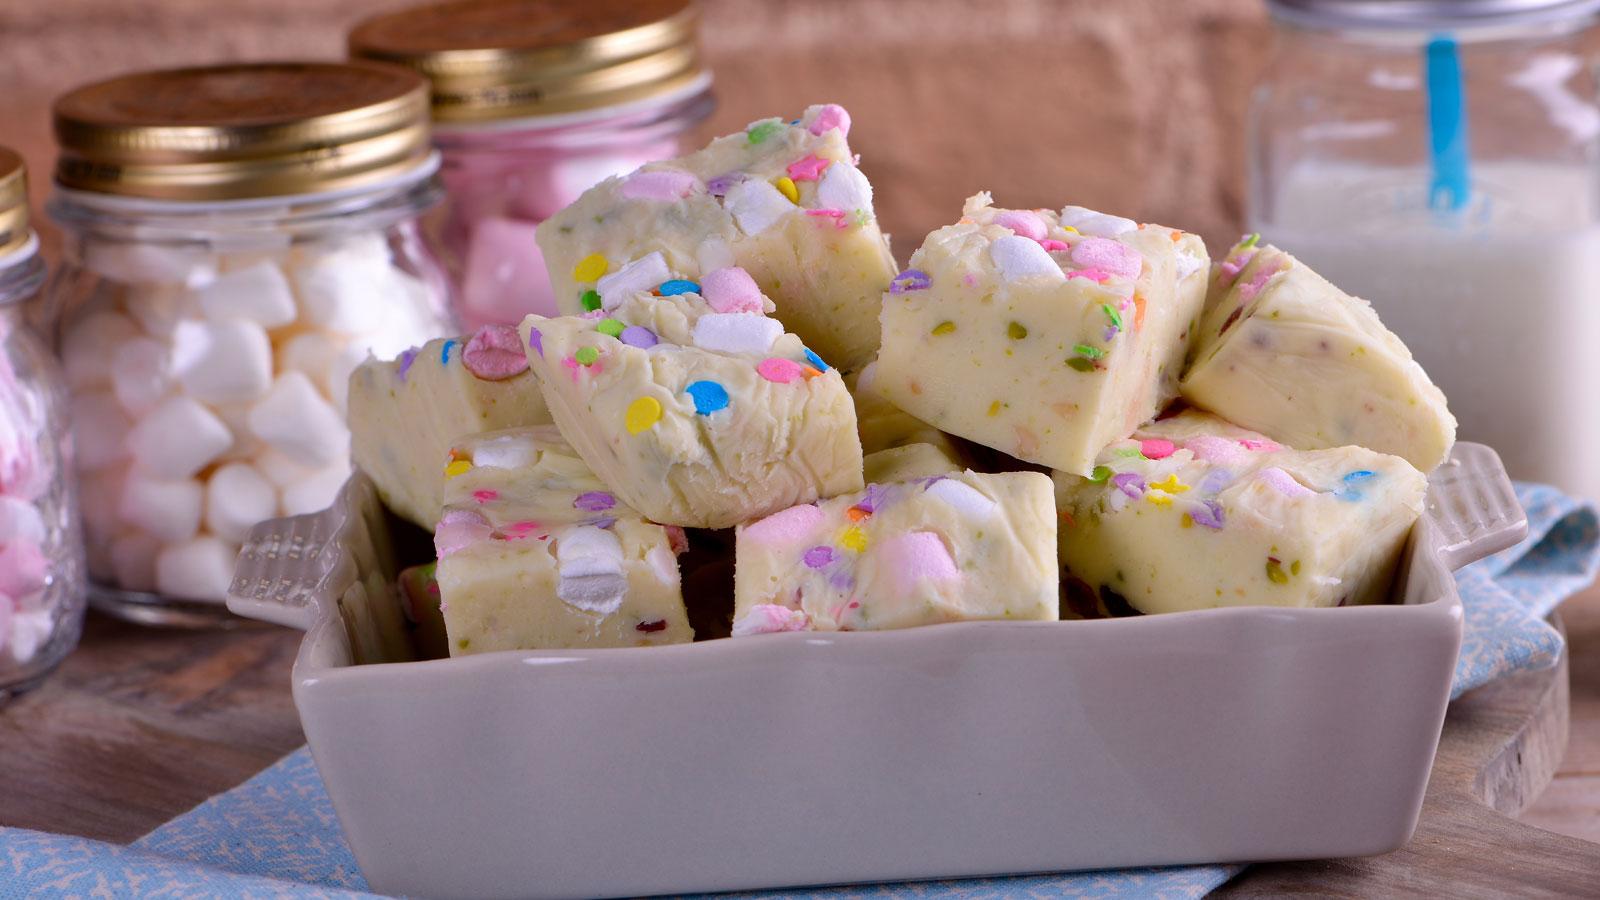 Fudge de chocolate blanco alma obreg n receta canal cocina - Canal cocina alma obregon ...